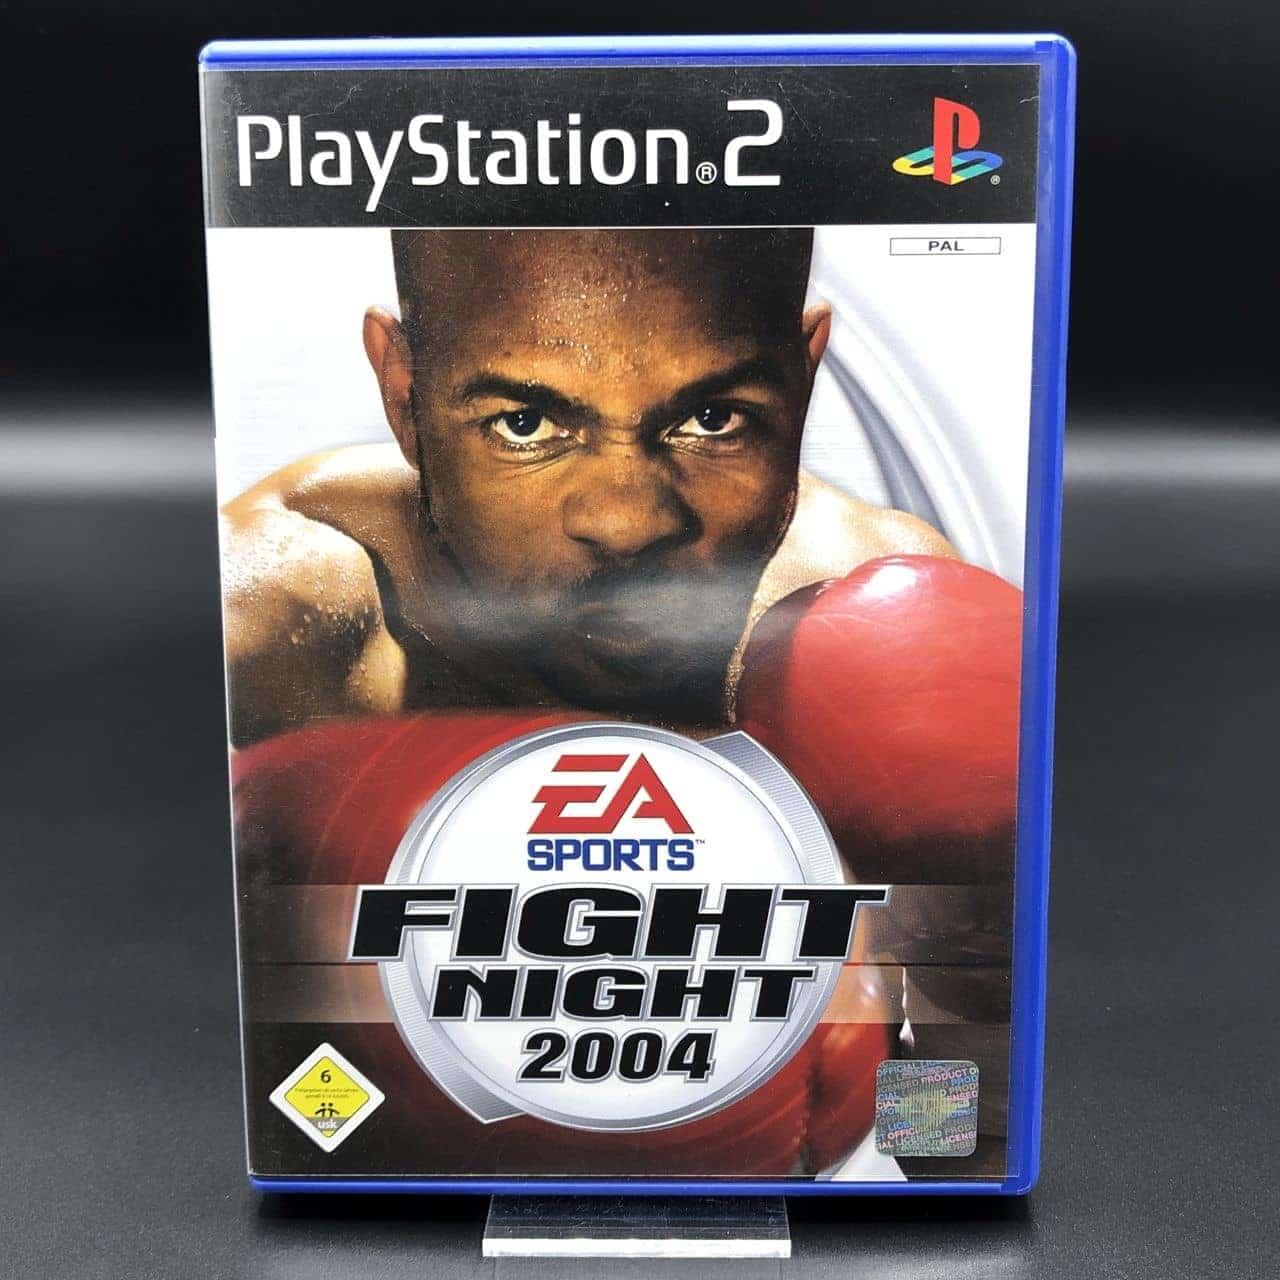 PS2 EA Sports Fight Night 2004 (Komplett) (Sehr gut) Sony PlayStation 2